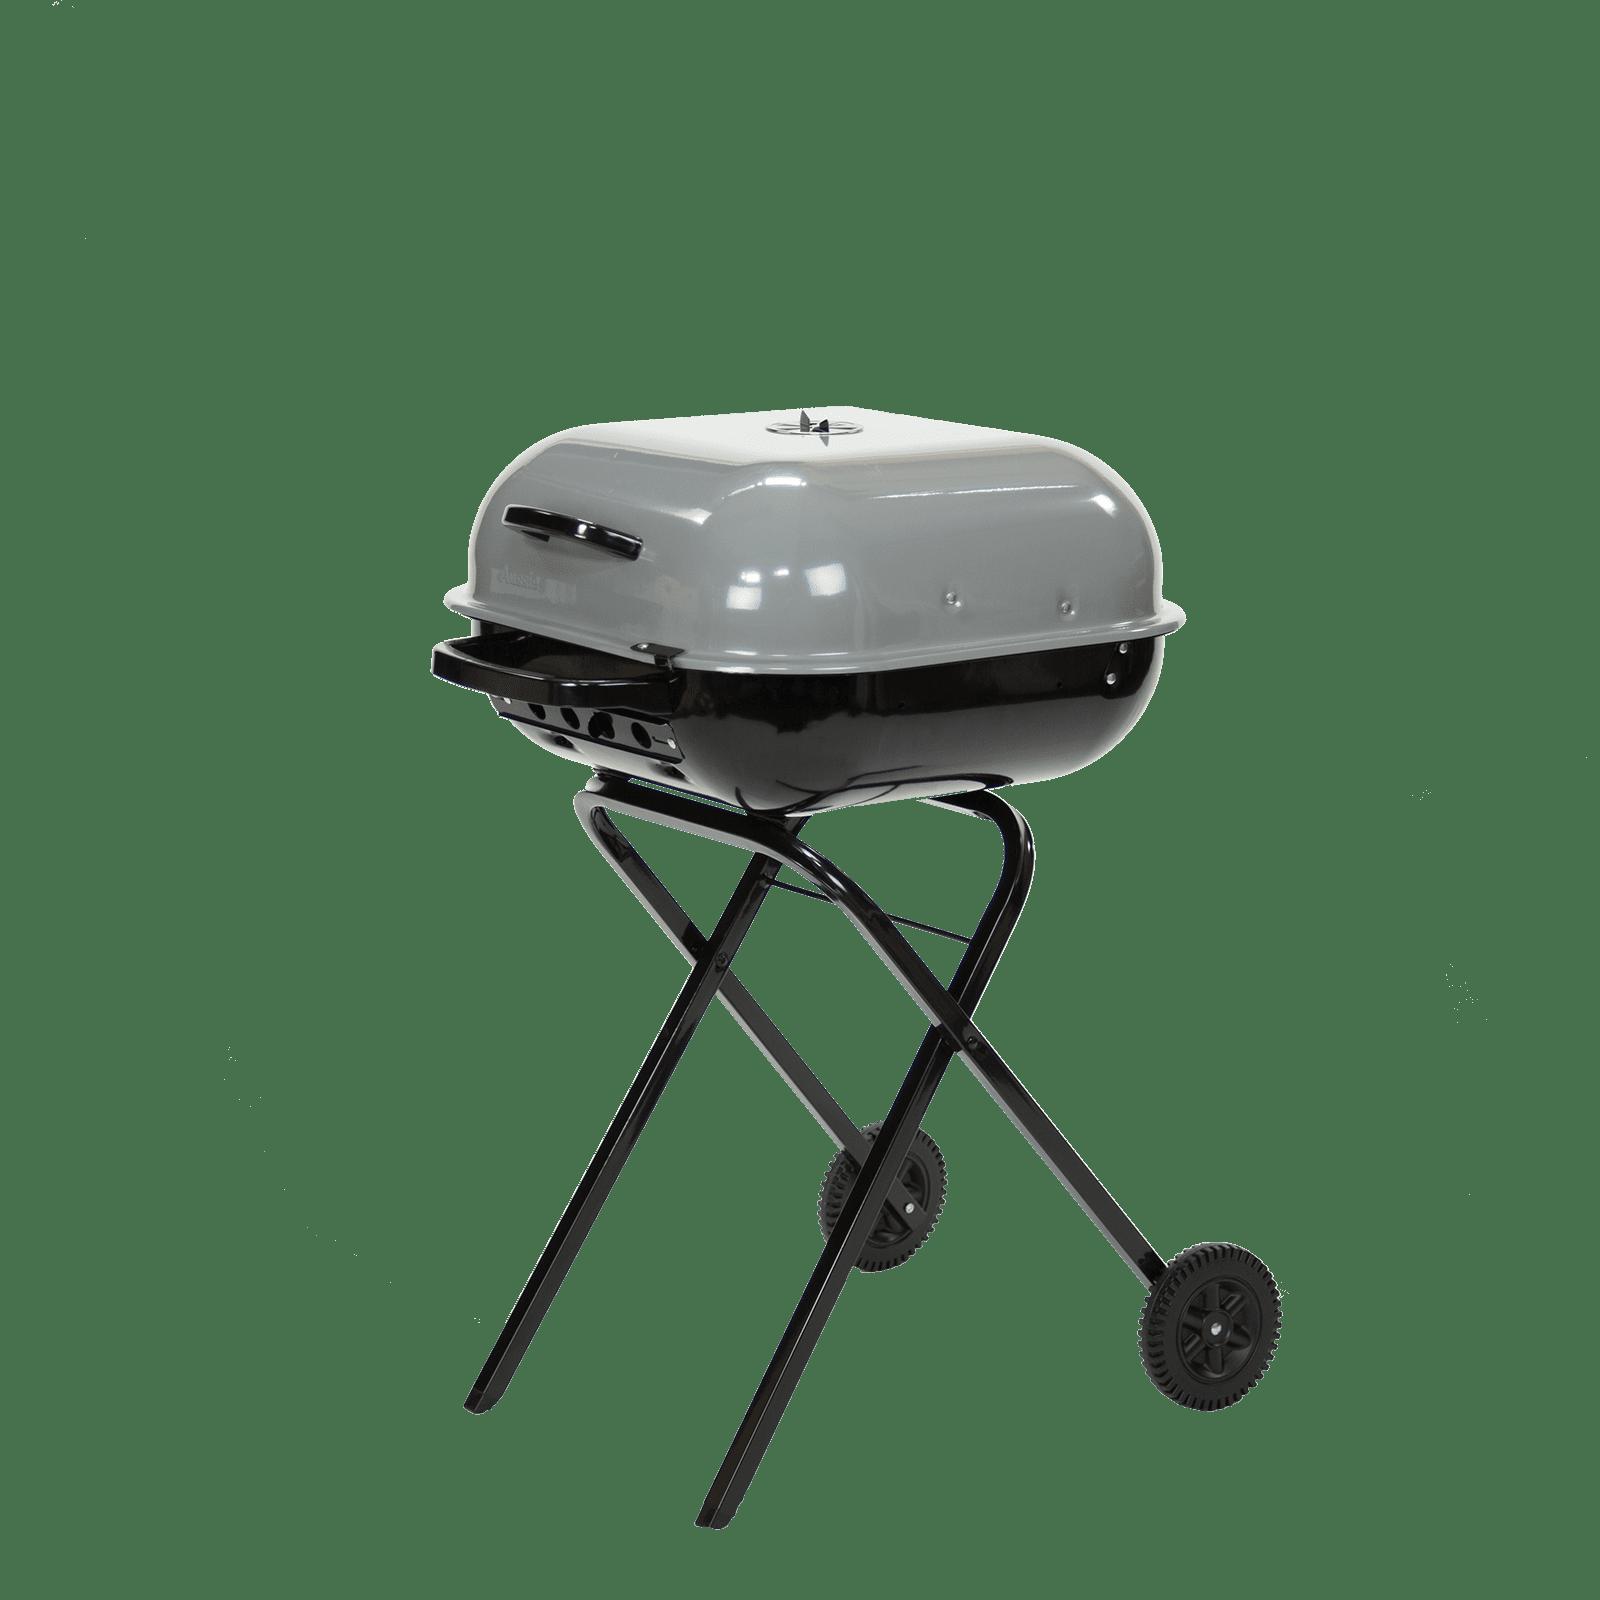 Americana Walk-A-Bout Charcoal Grill in Sports Fan Gray